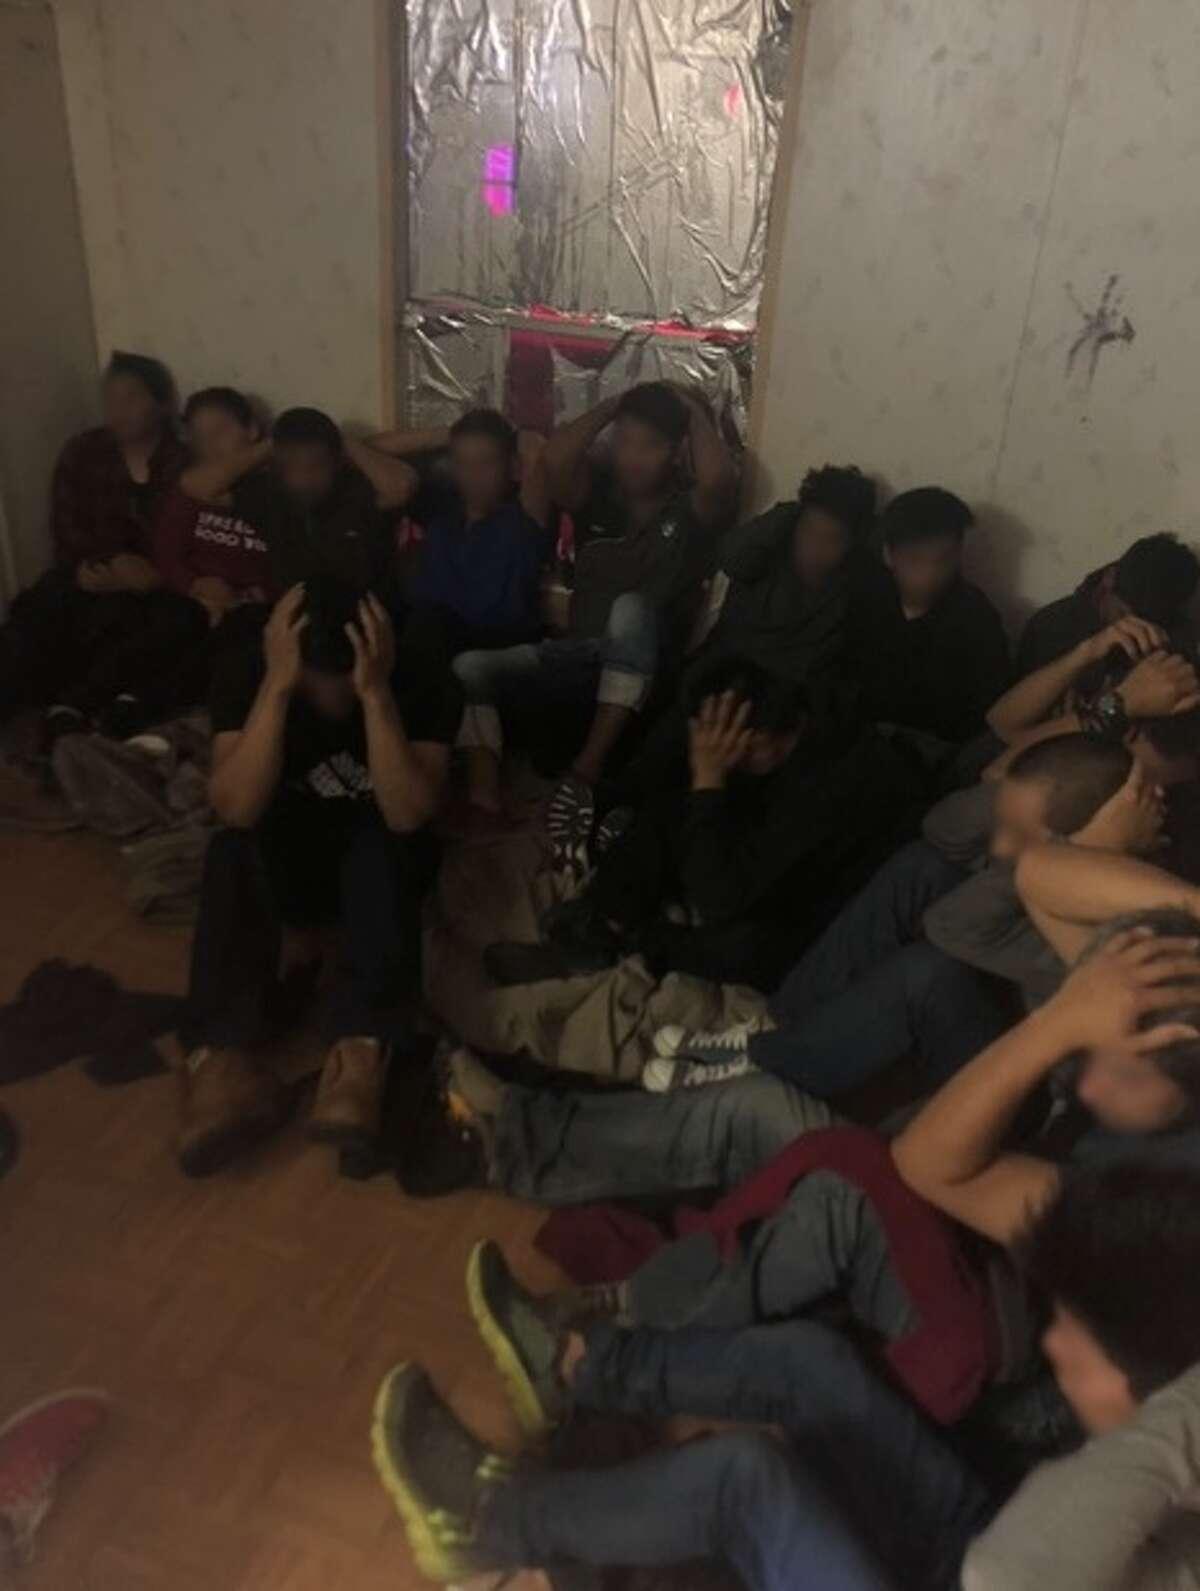 USBP arrested 31 in a Laredo stash house.